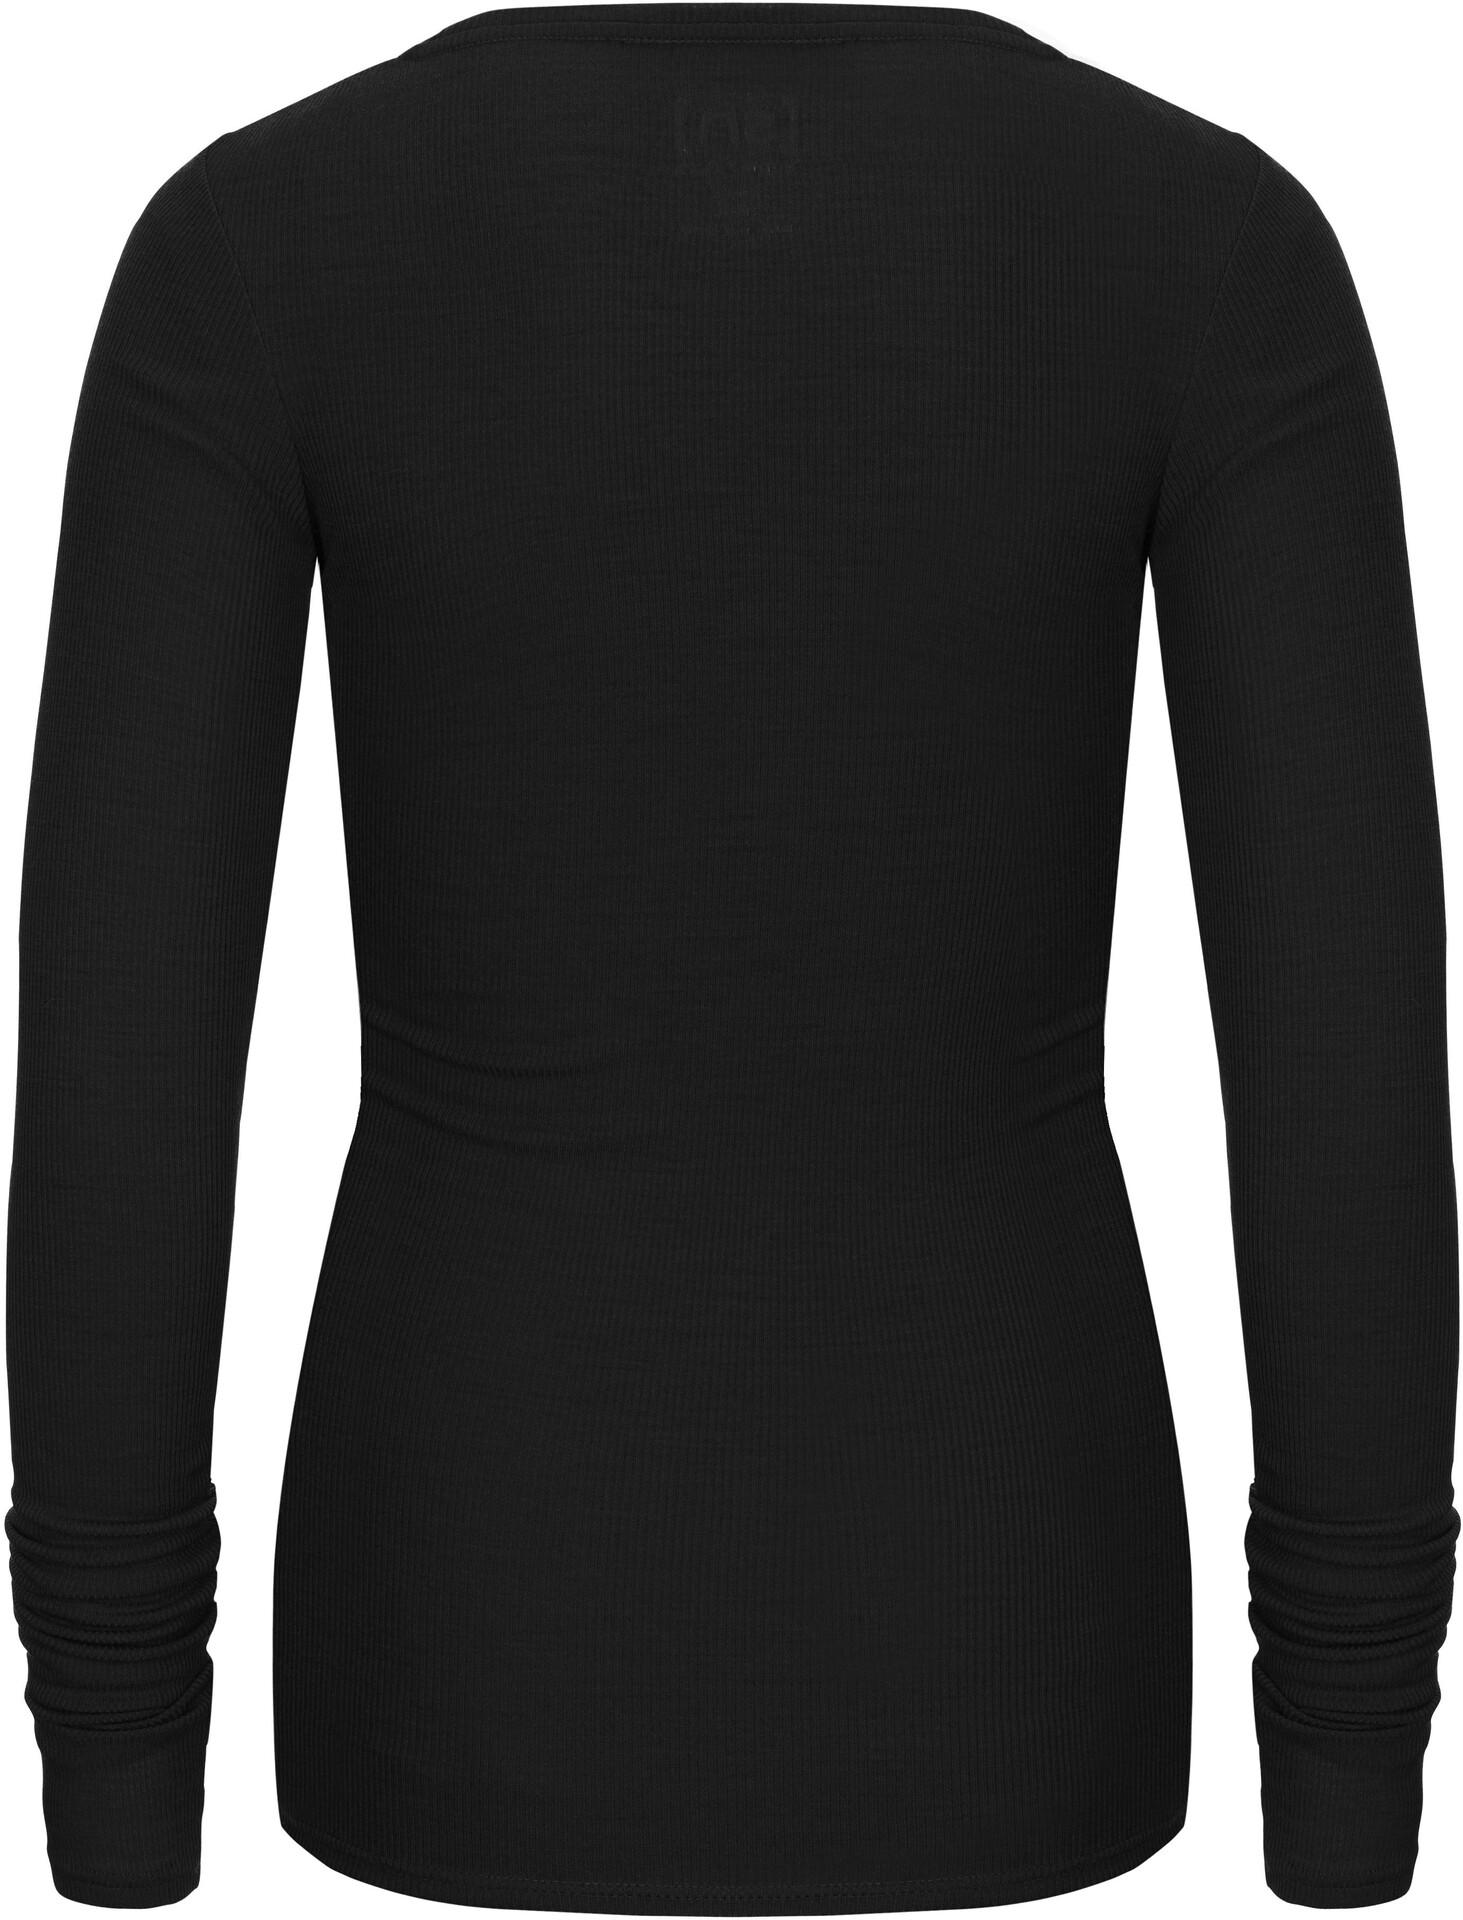 super.natural Rib Langærmet T shirt Damer, jet black